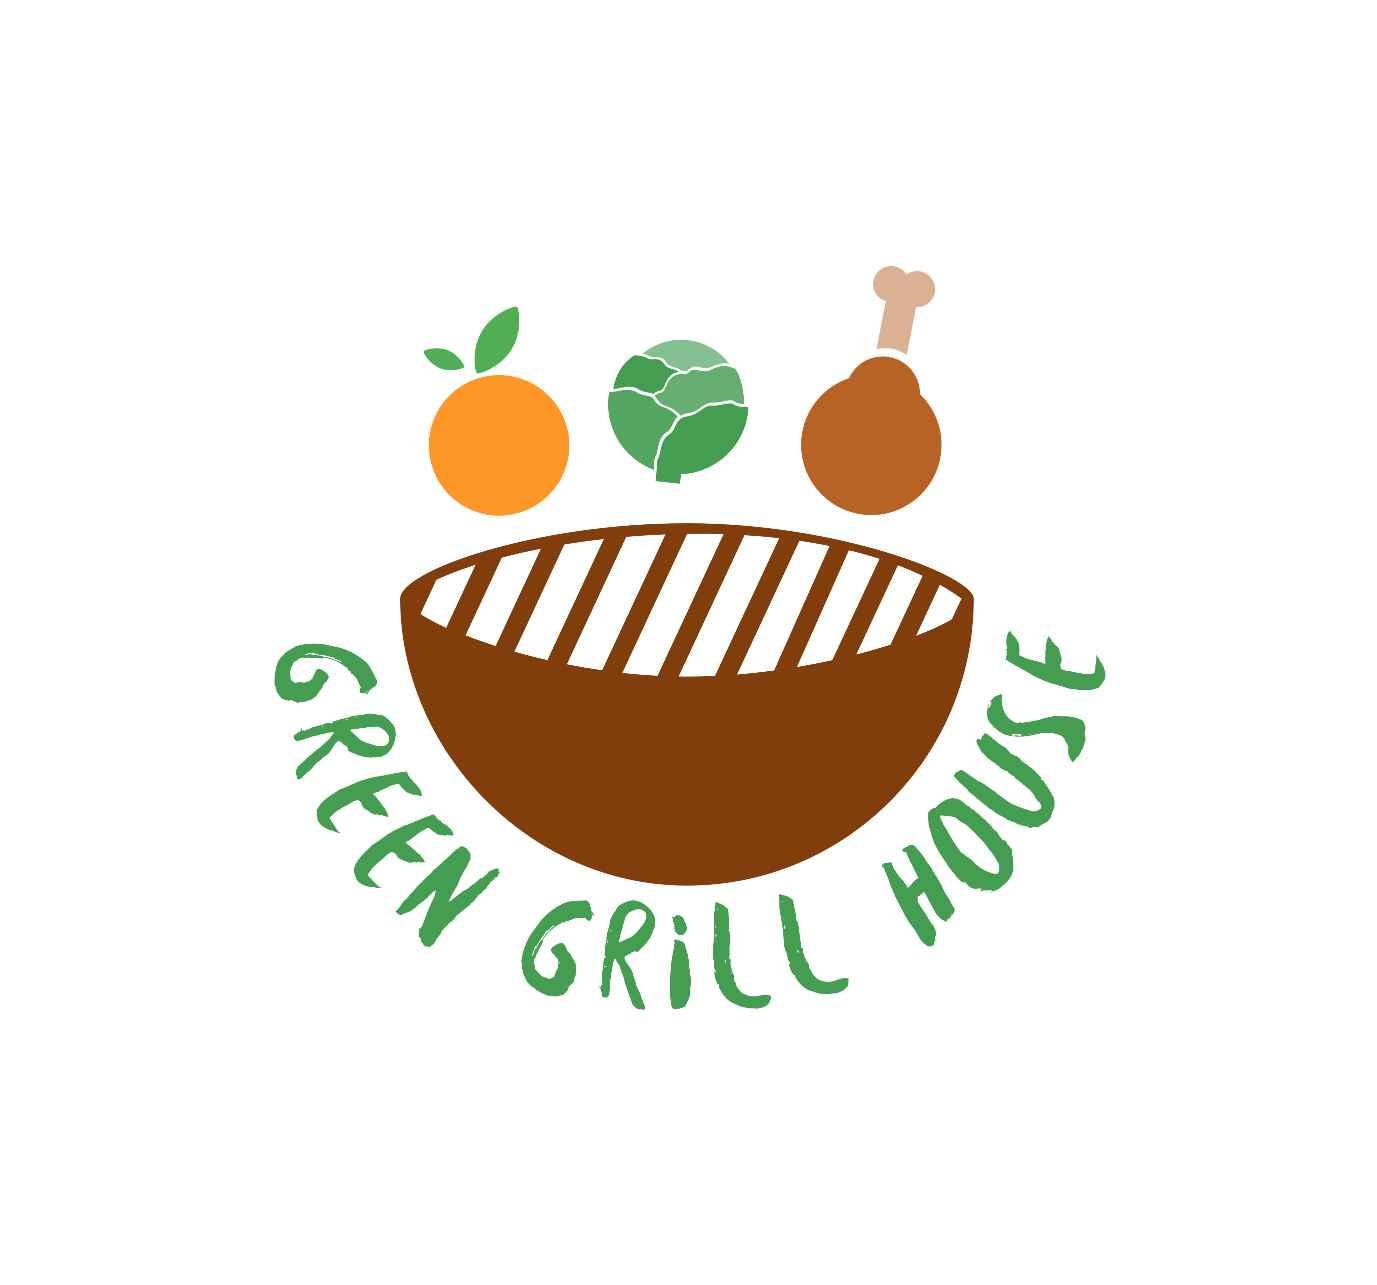 Greengrillhouse